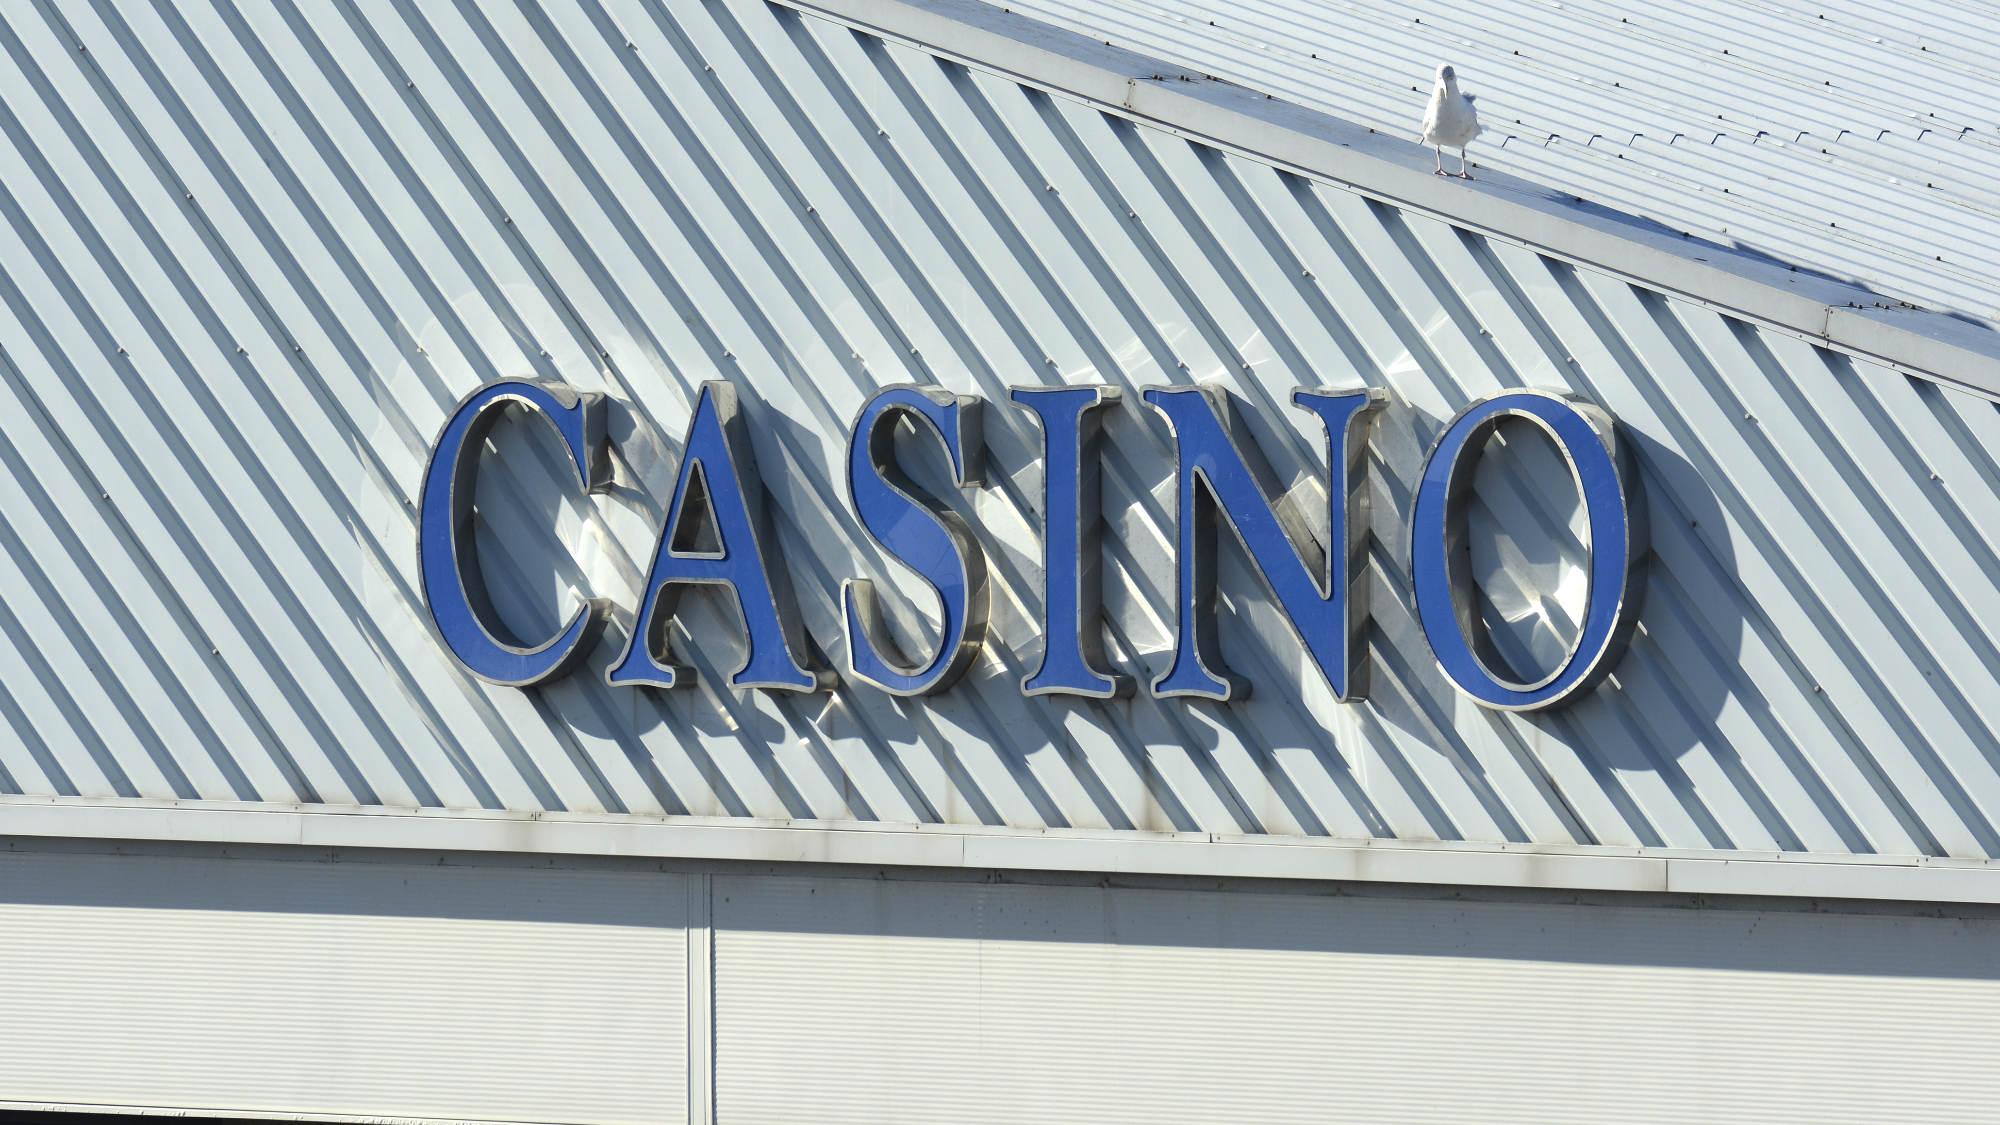 Tanda kasino di Rendezvous Brighton Marina